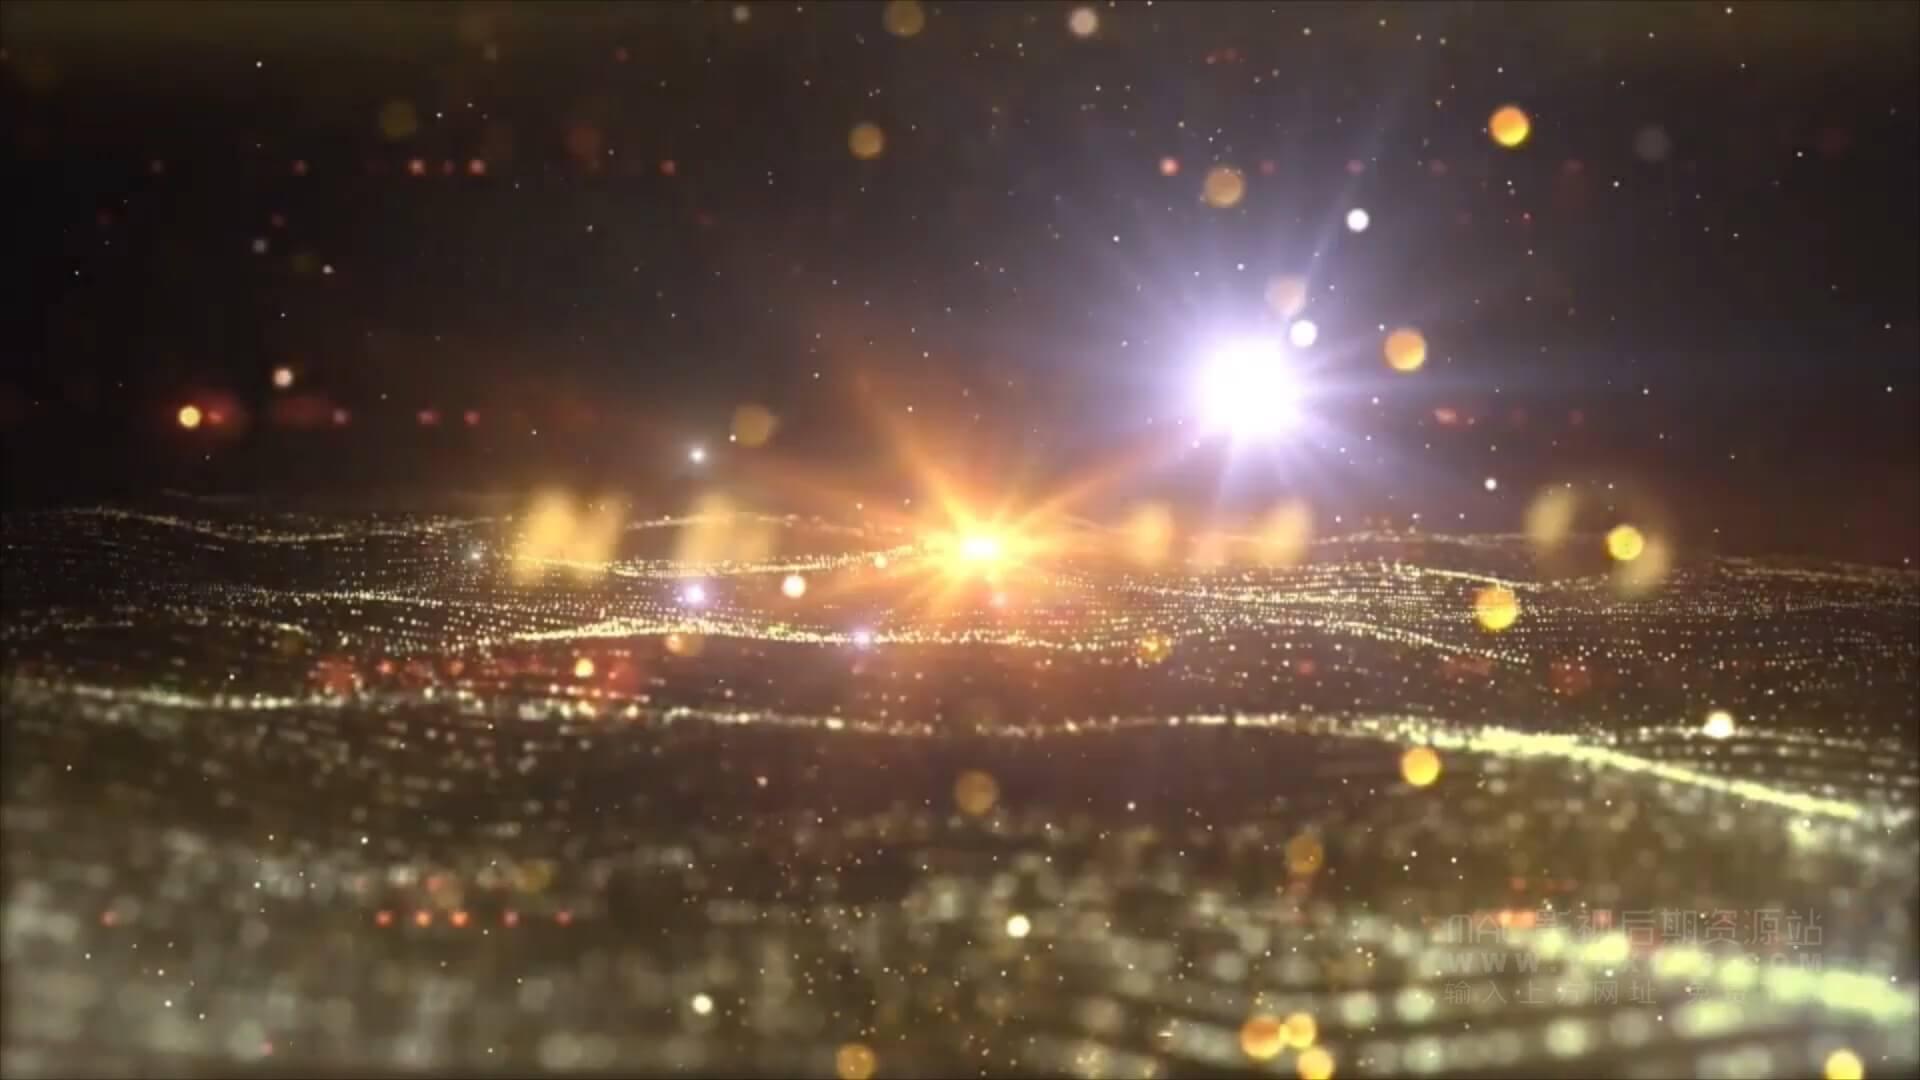 Motion模板 企业公司年会颁奖典礼开场预告片 辉煌大气粒子场景